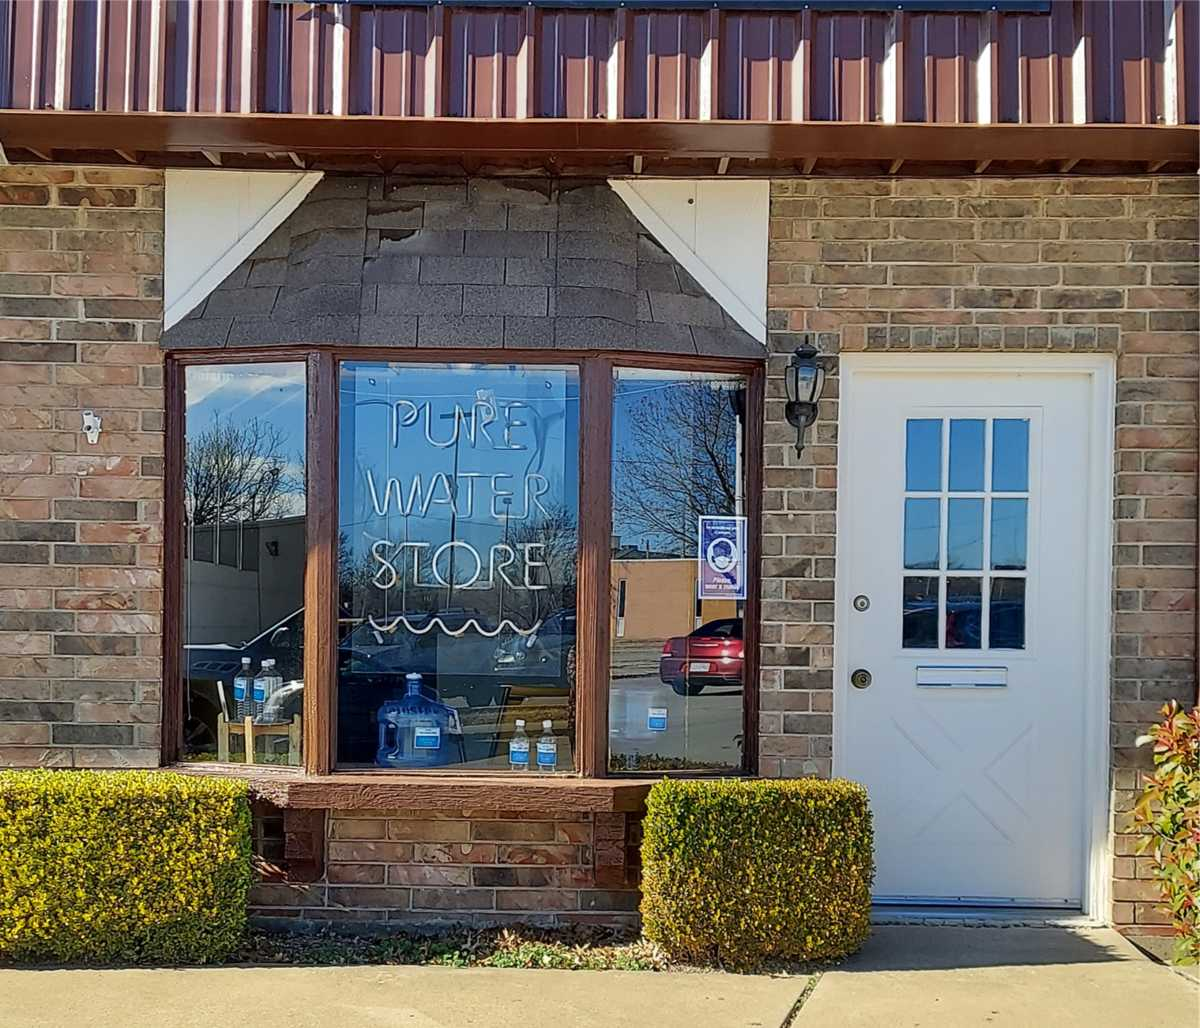 Property for Rent | Retail Rental #82 Pryor, OK 74361 0